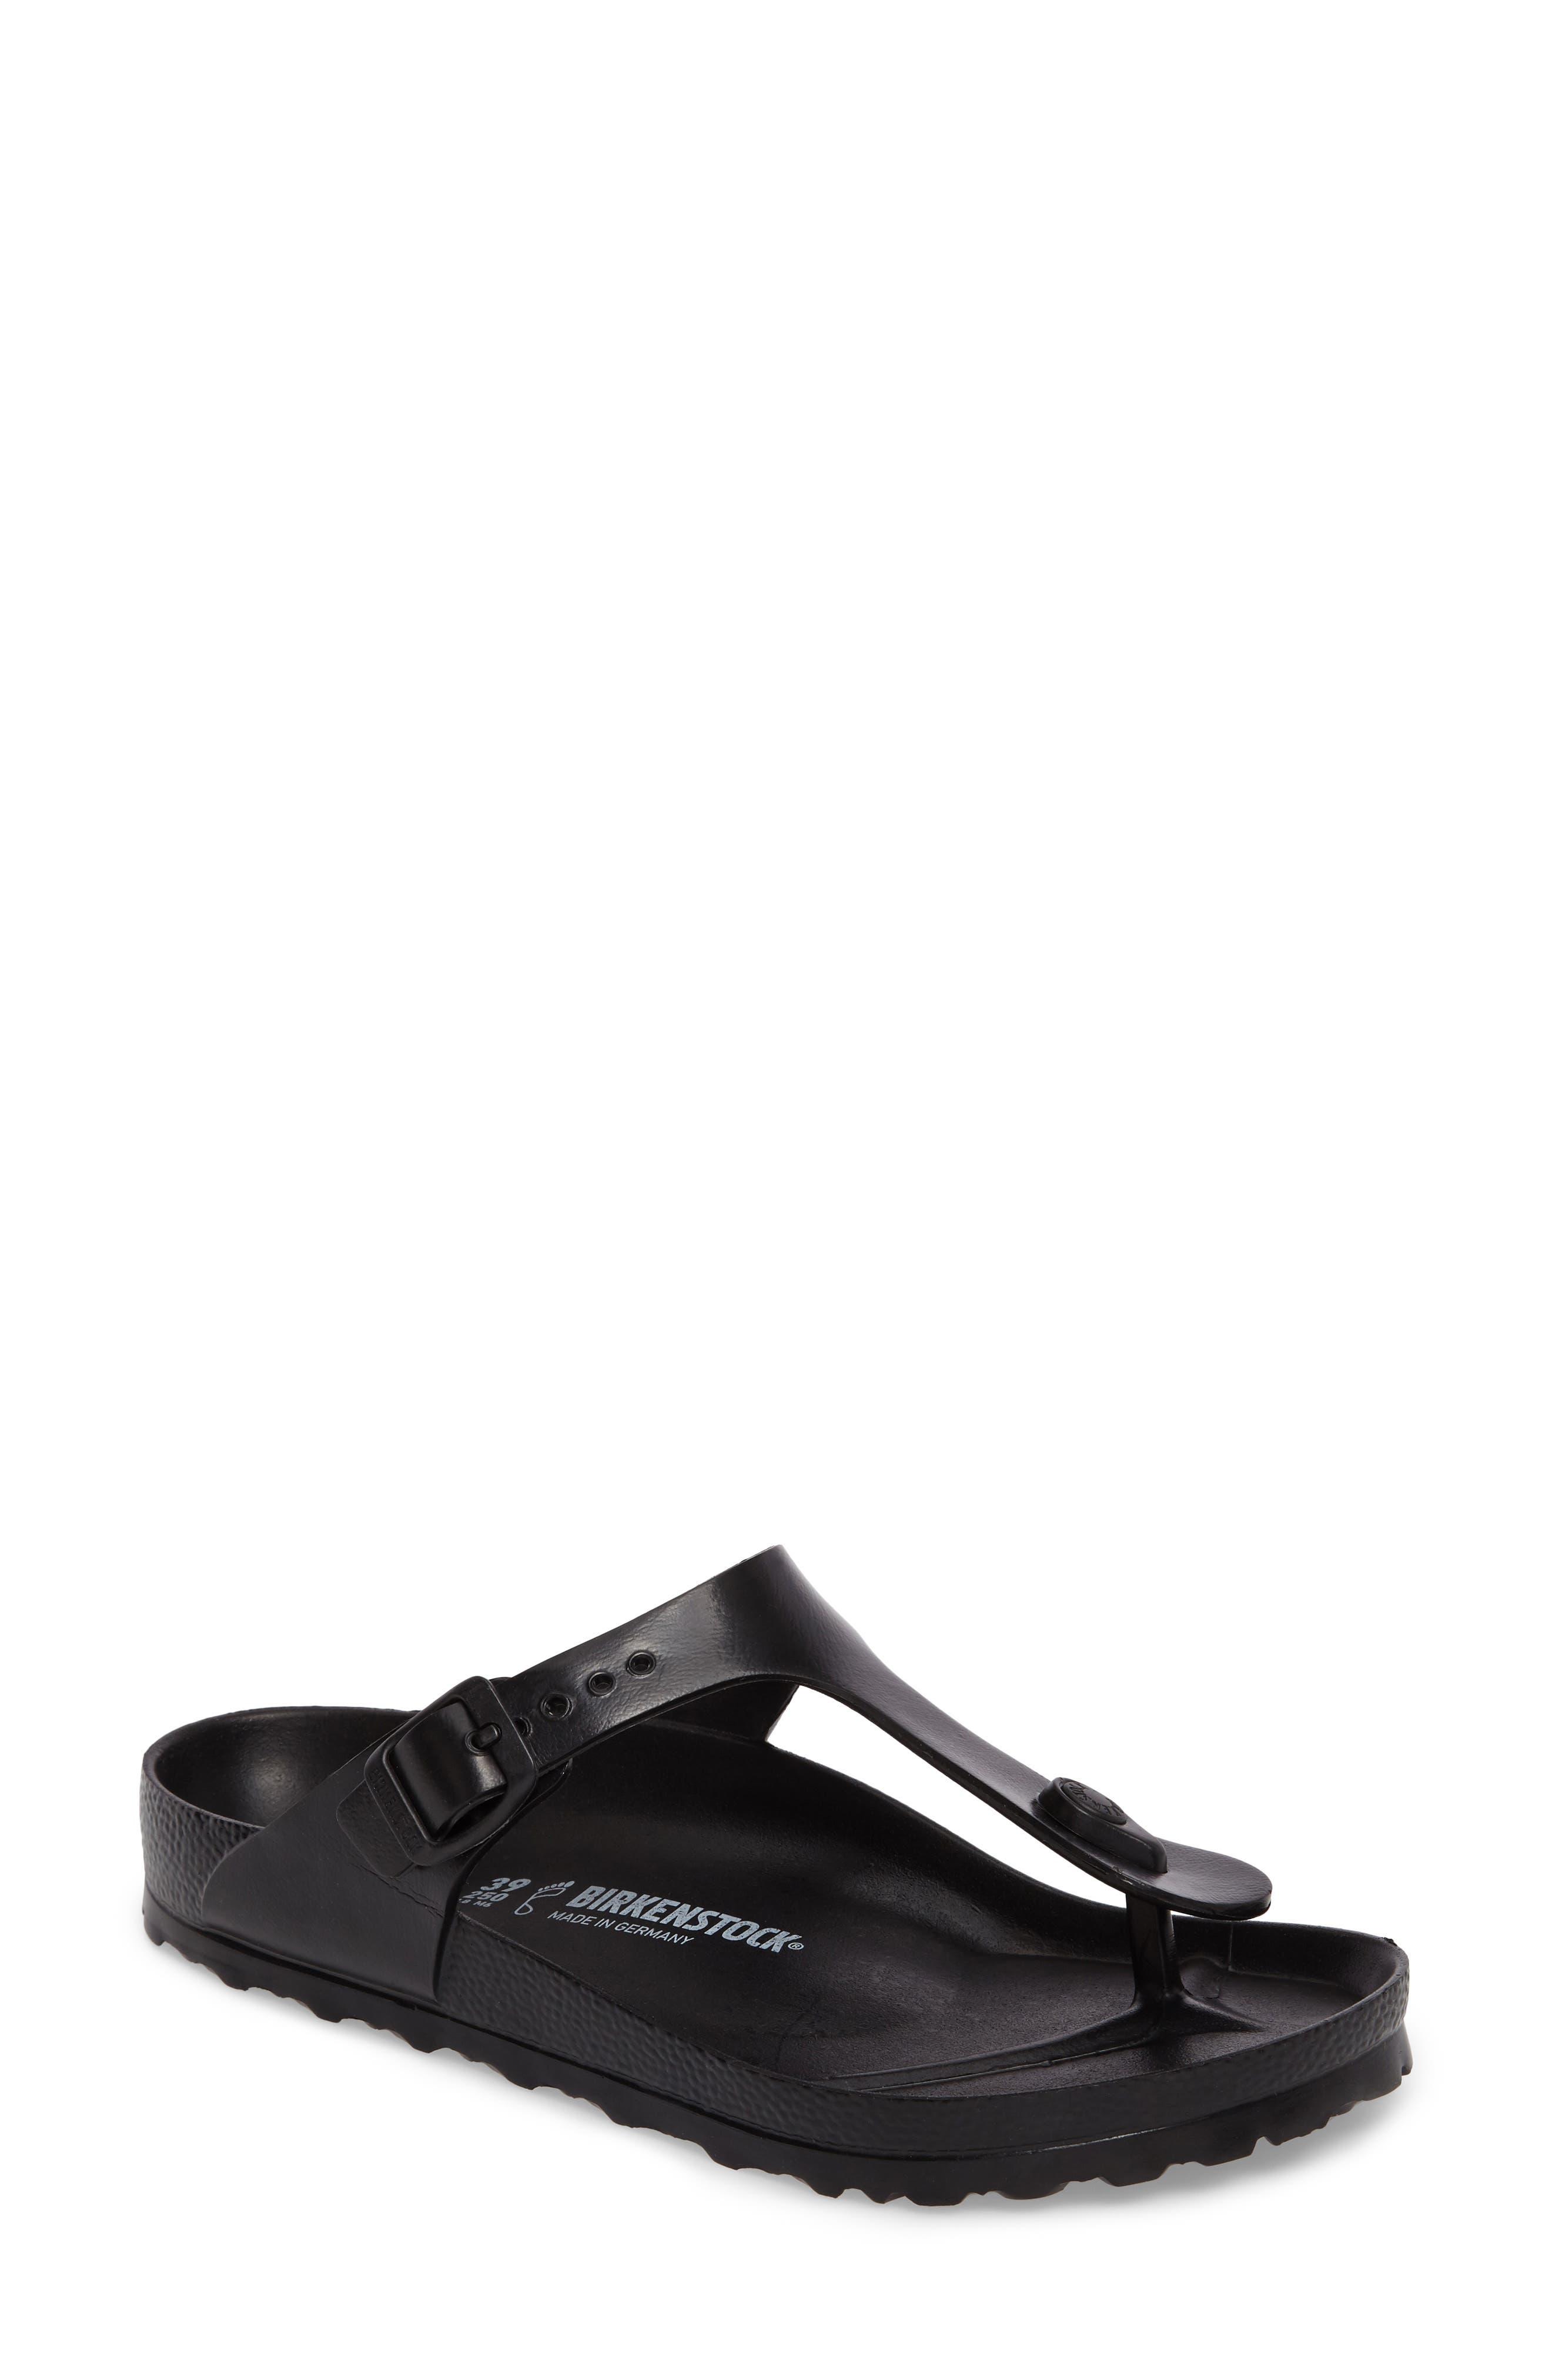 Birkenstock Essentials - Gizeh Flip Flop,5.5 - Black